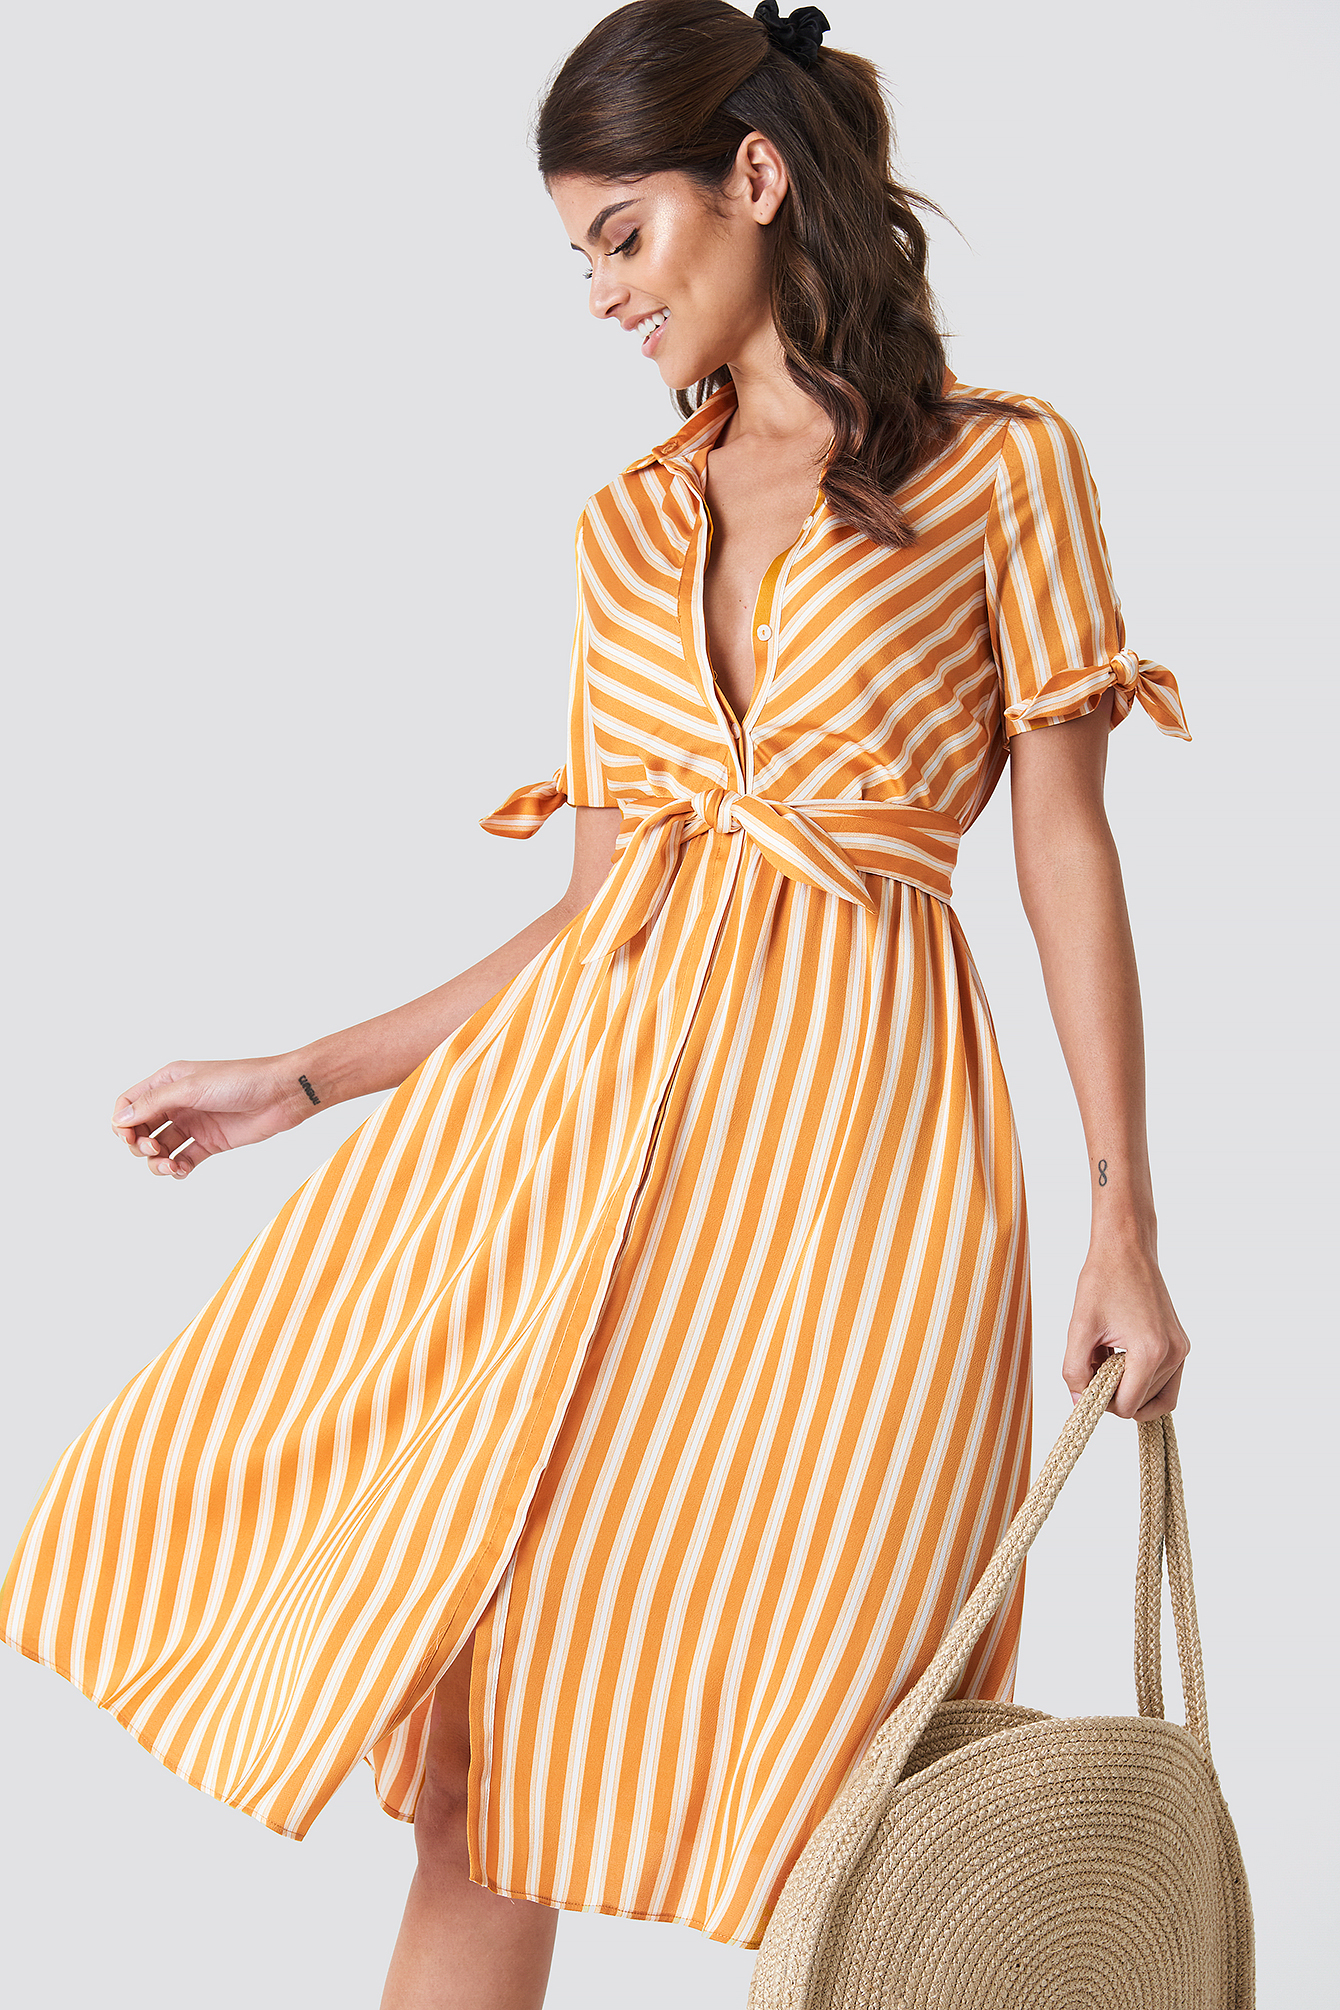 Puhvihihainen mekko (With images) | Yellow striped dress